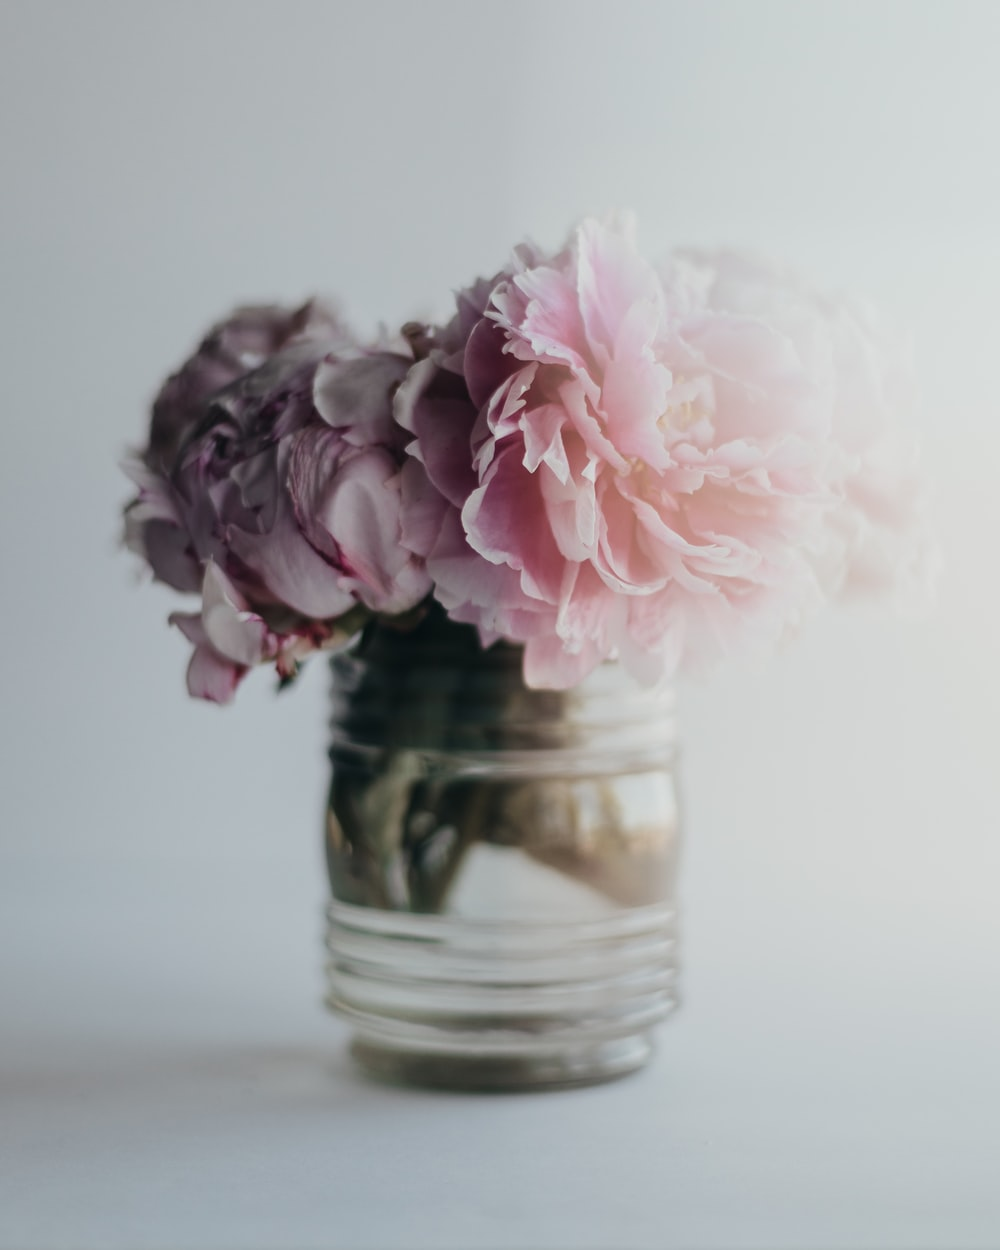 pink flower in clear glass jar